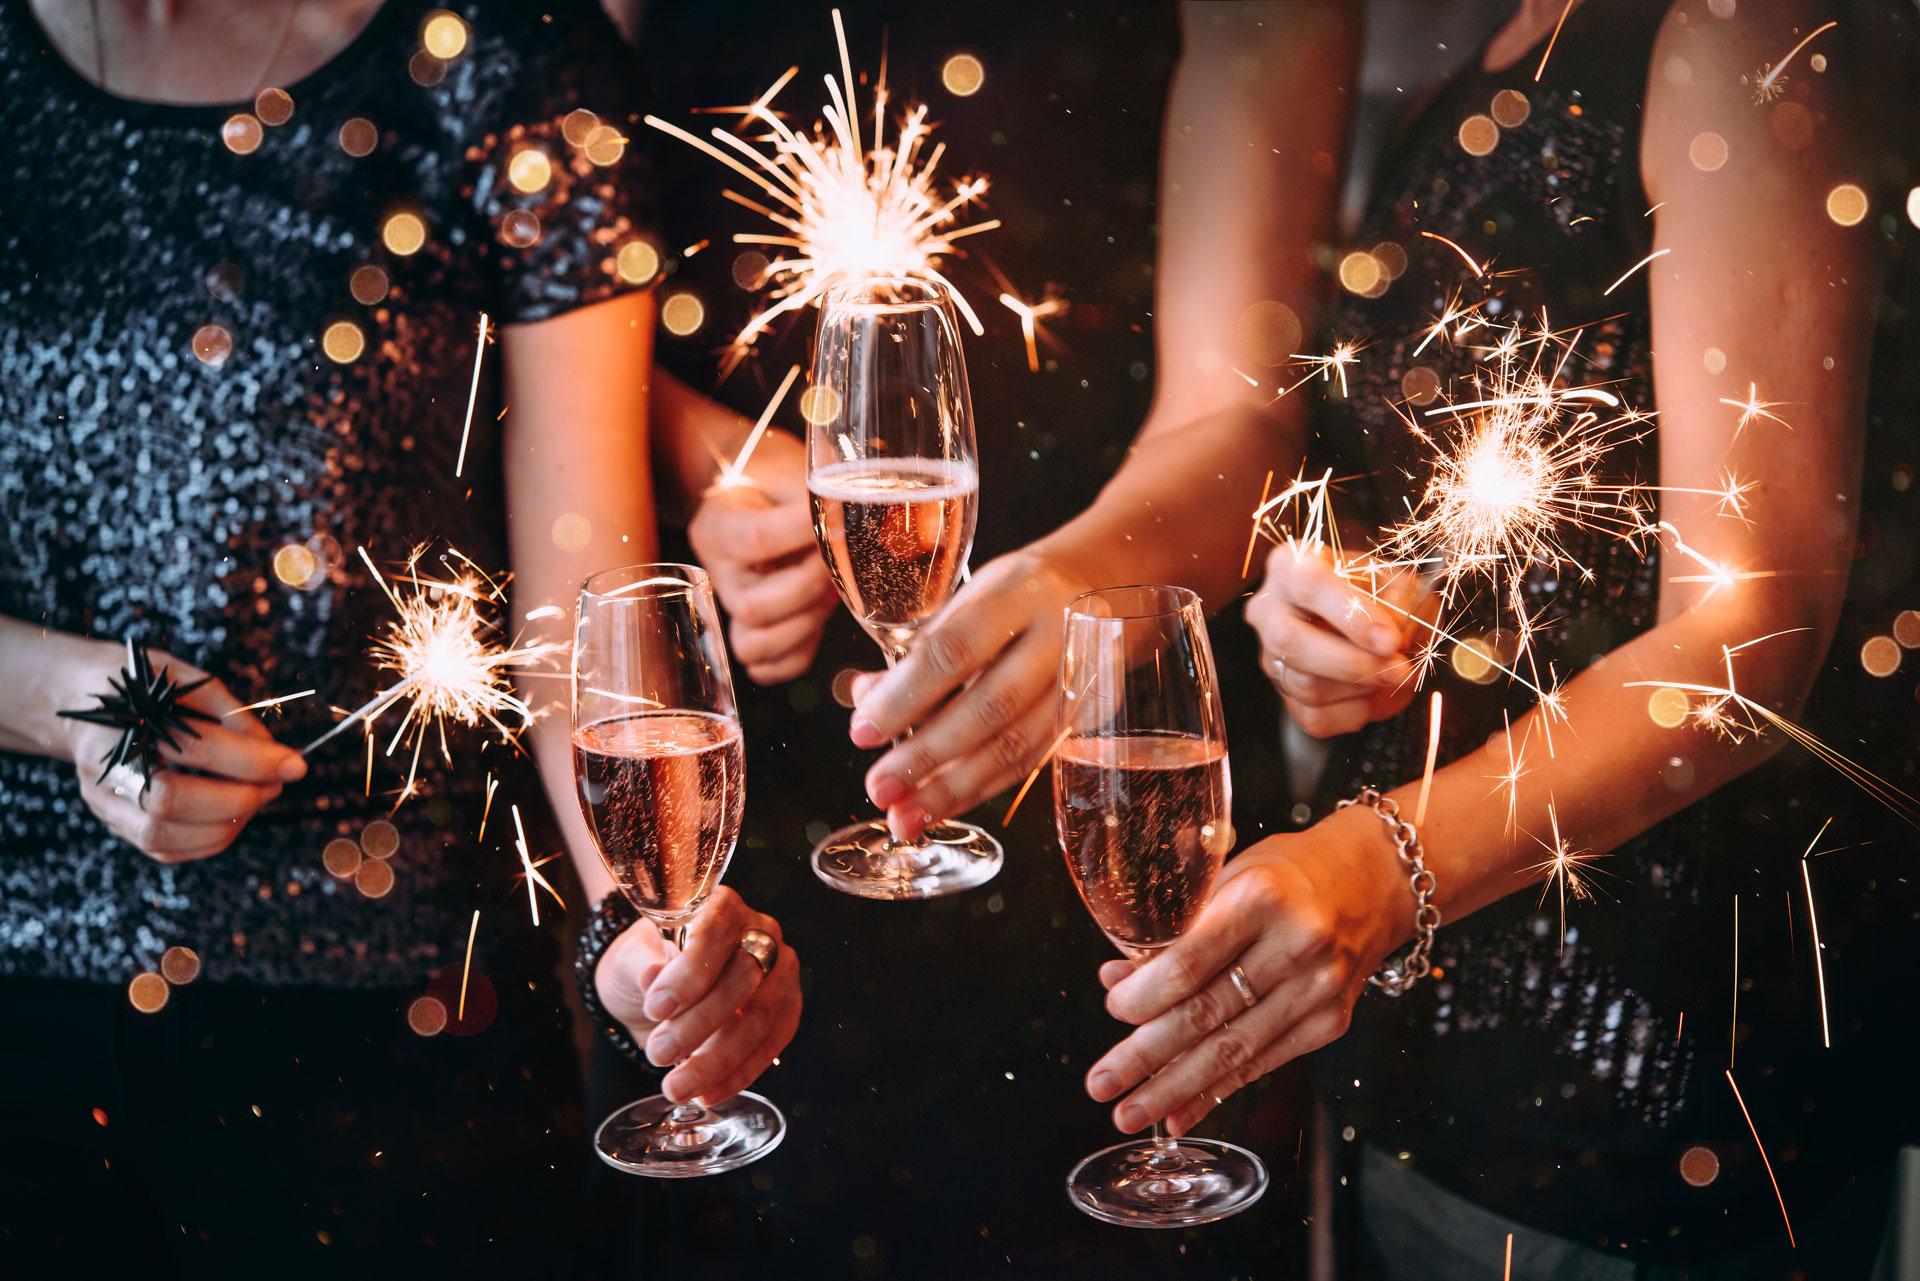 Atendemos todos os tipos de eventos particulares ou corporativos, grandes festas, casamentos  e formaturas.